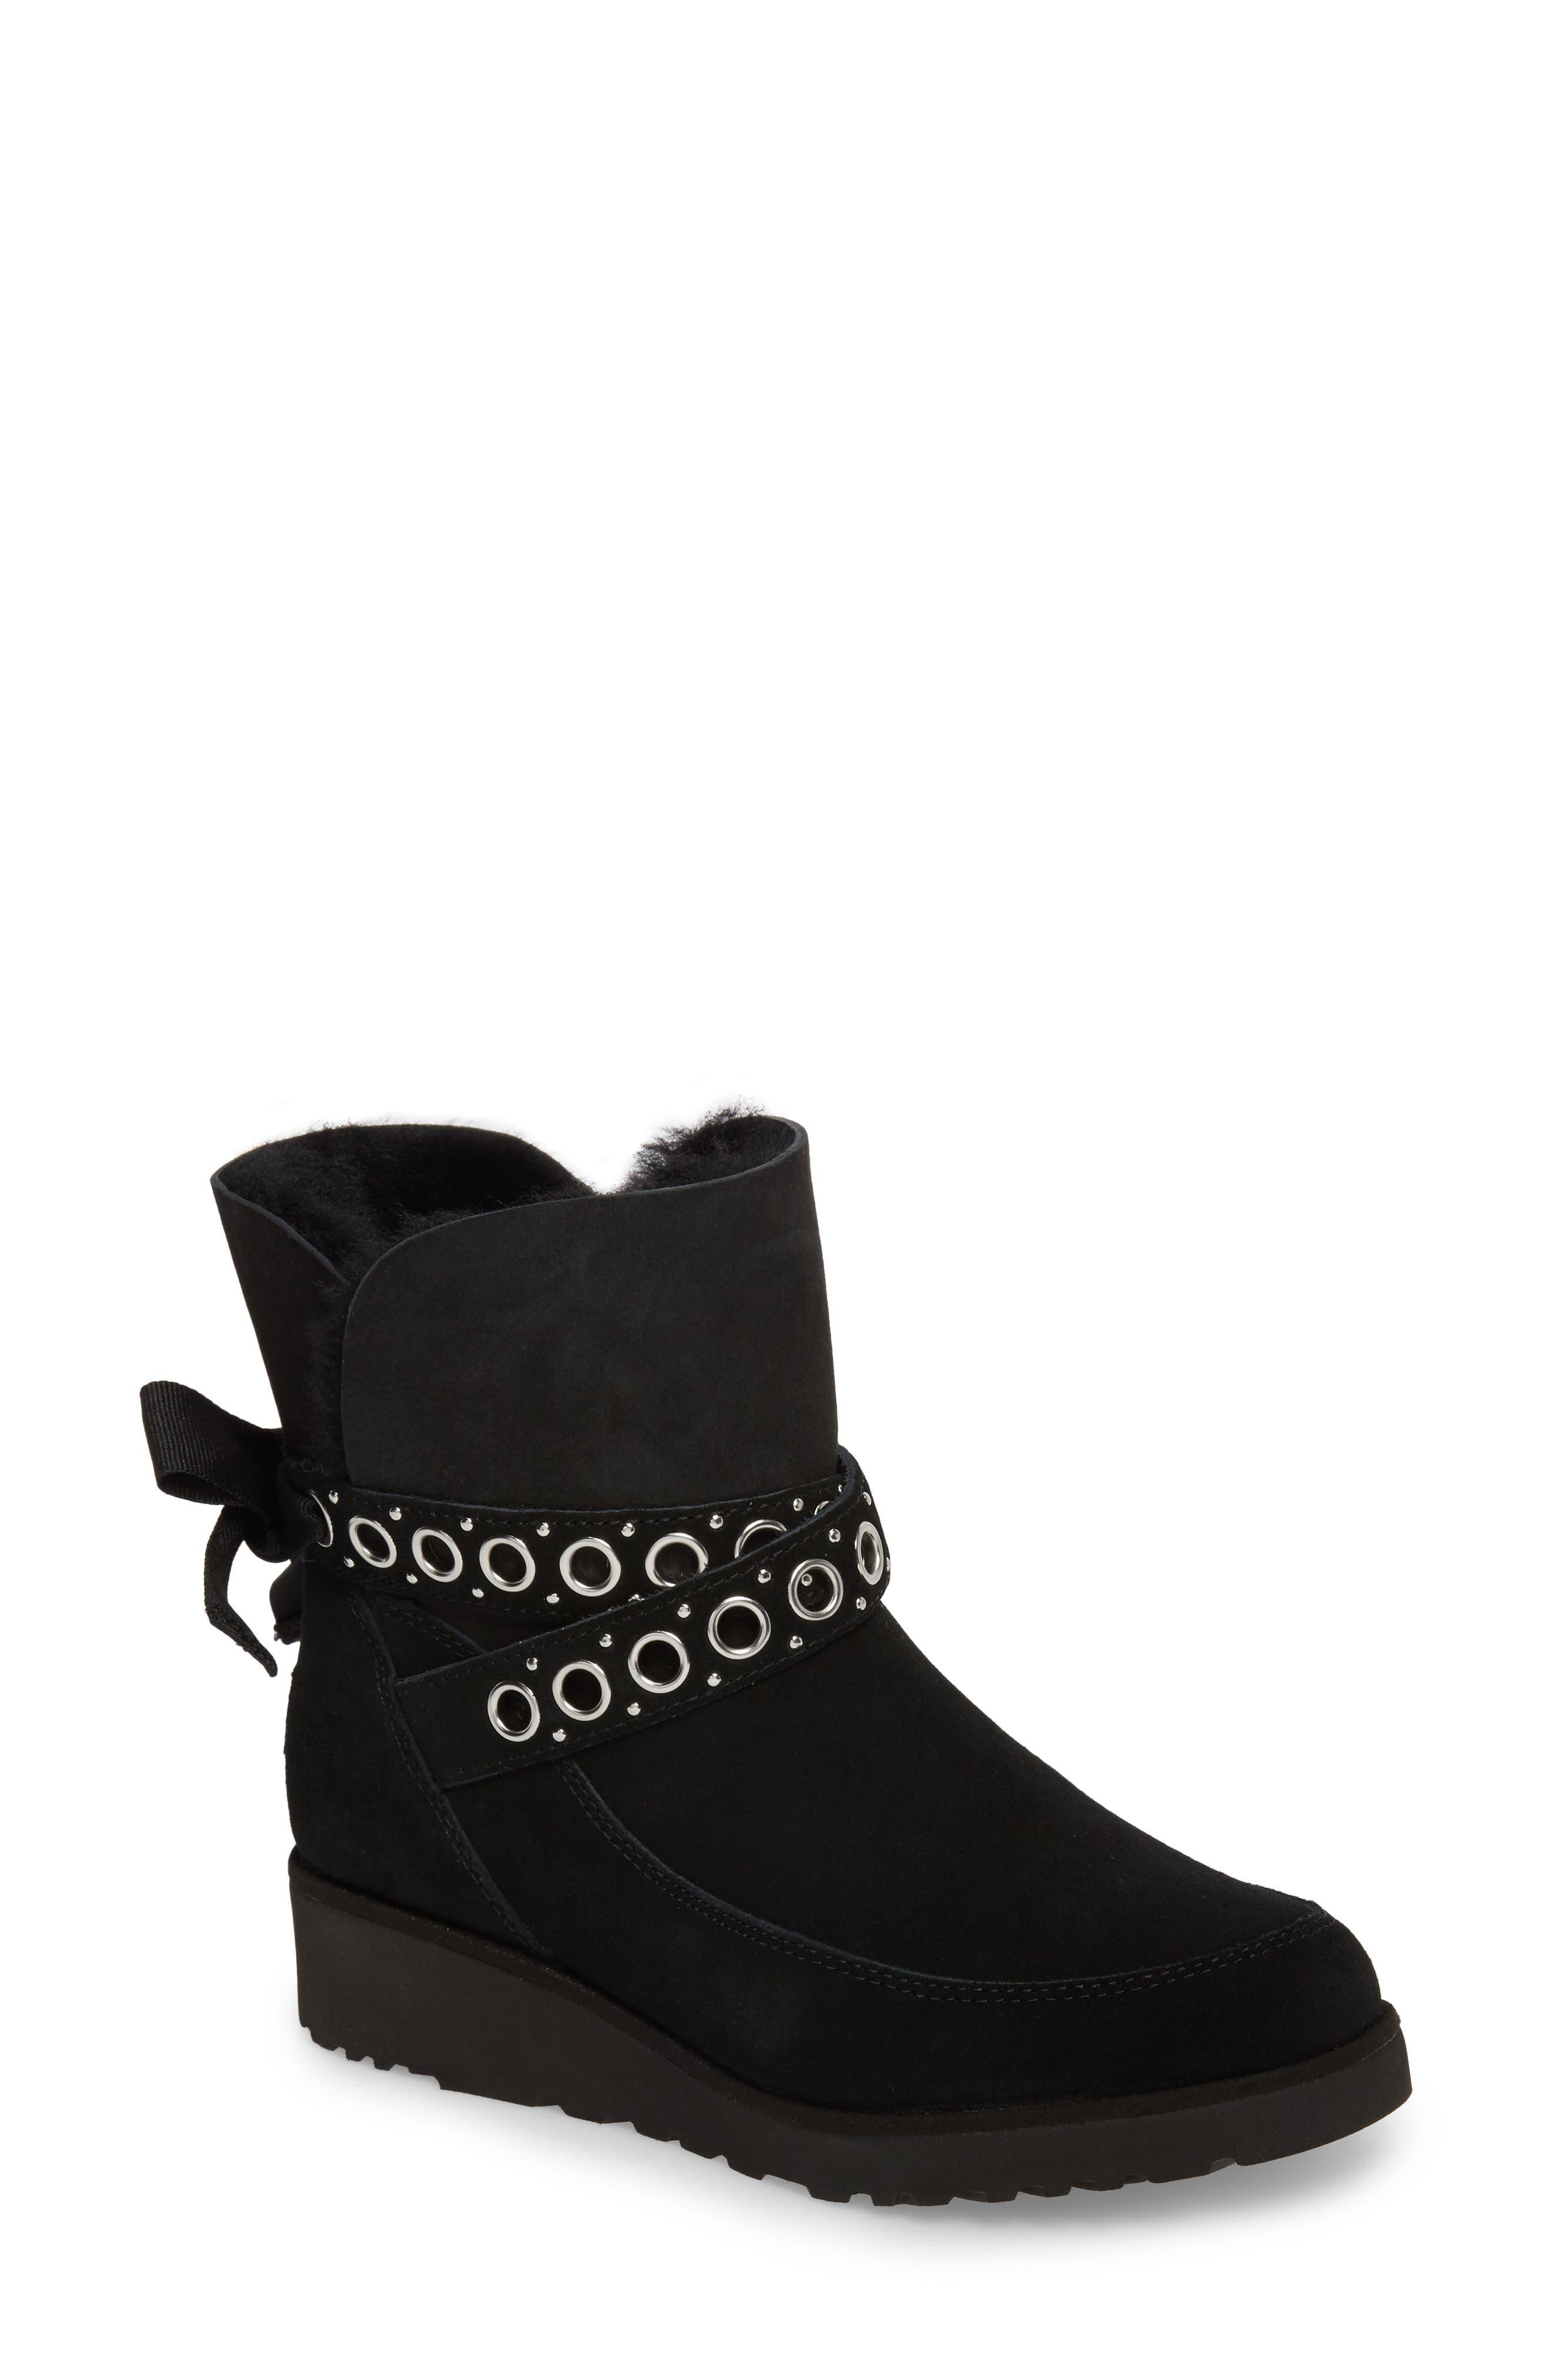 Alisia Grommet Bow Boot,                             Main thumbnail 1, color,                             001